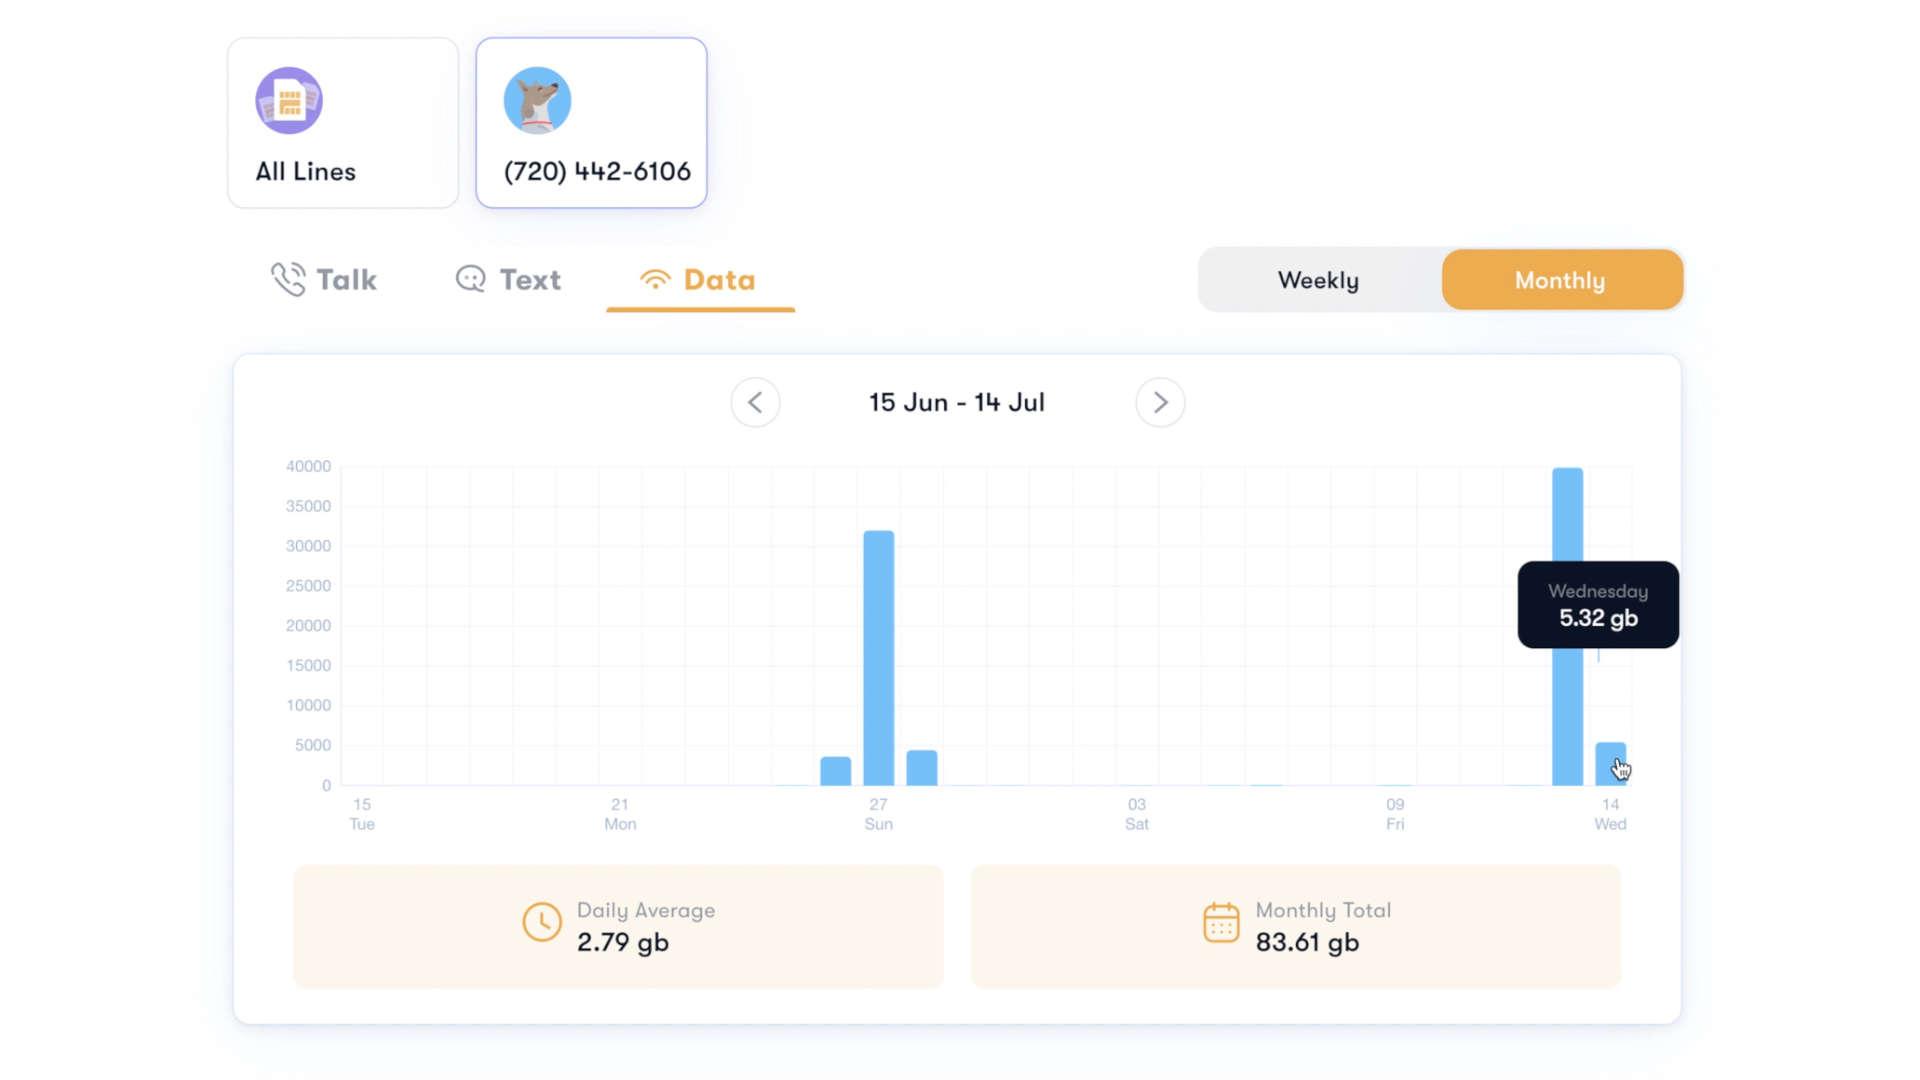 US Mobile data usage analytics tool on website